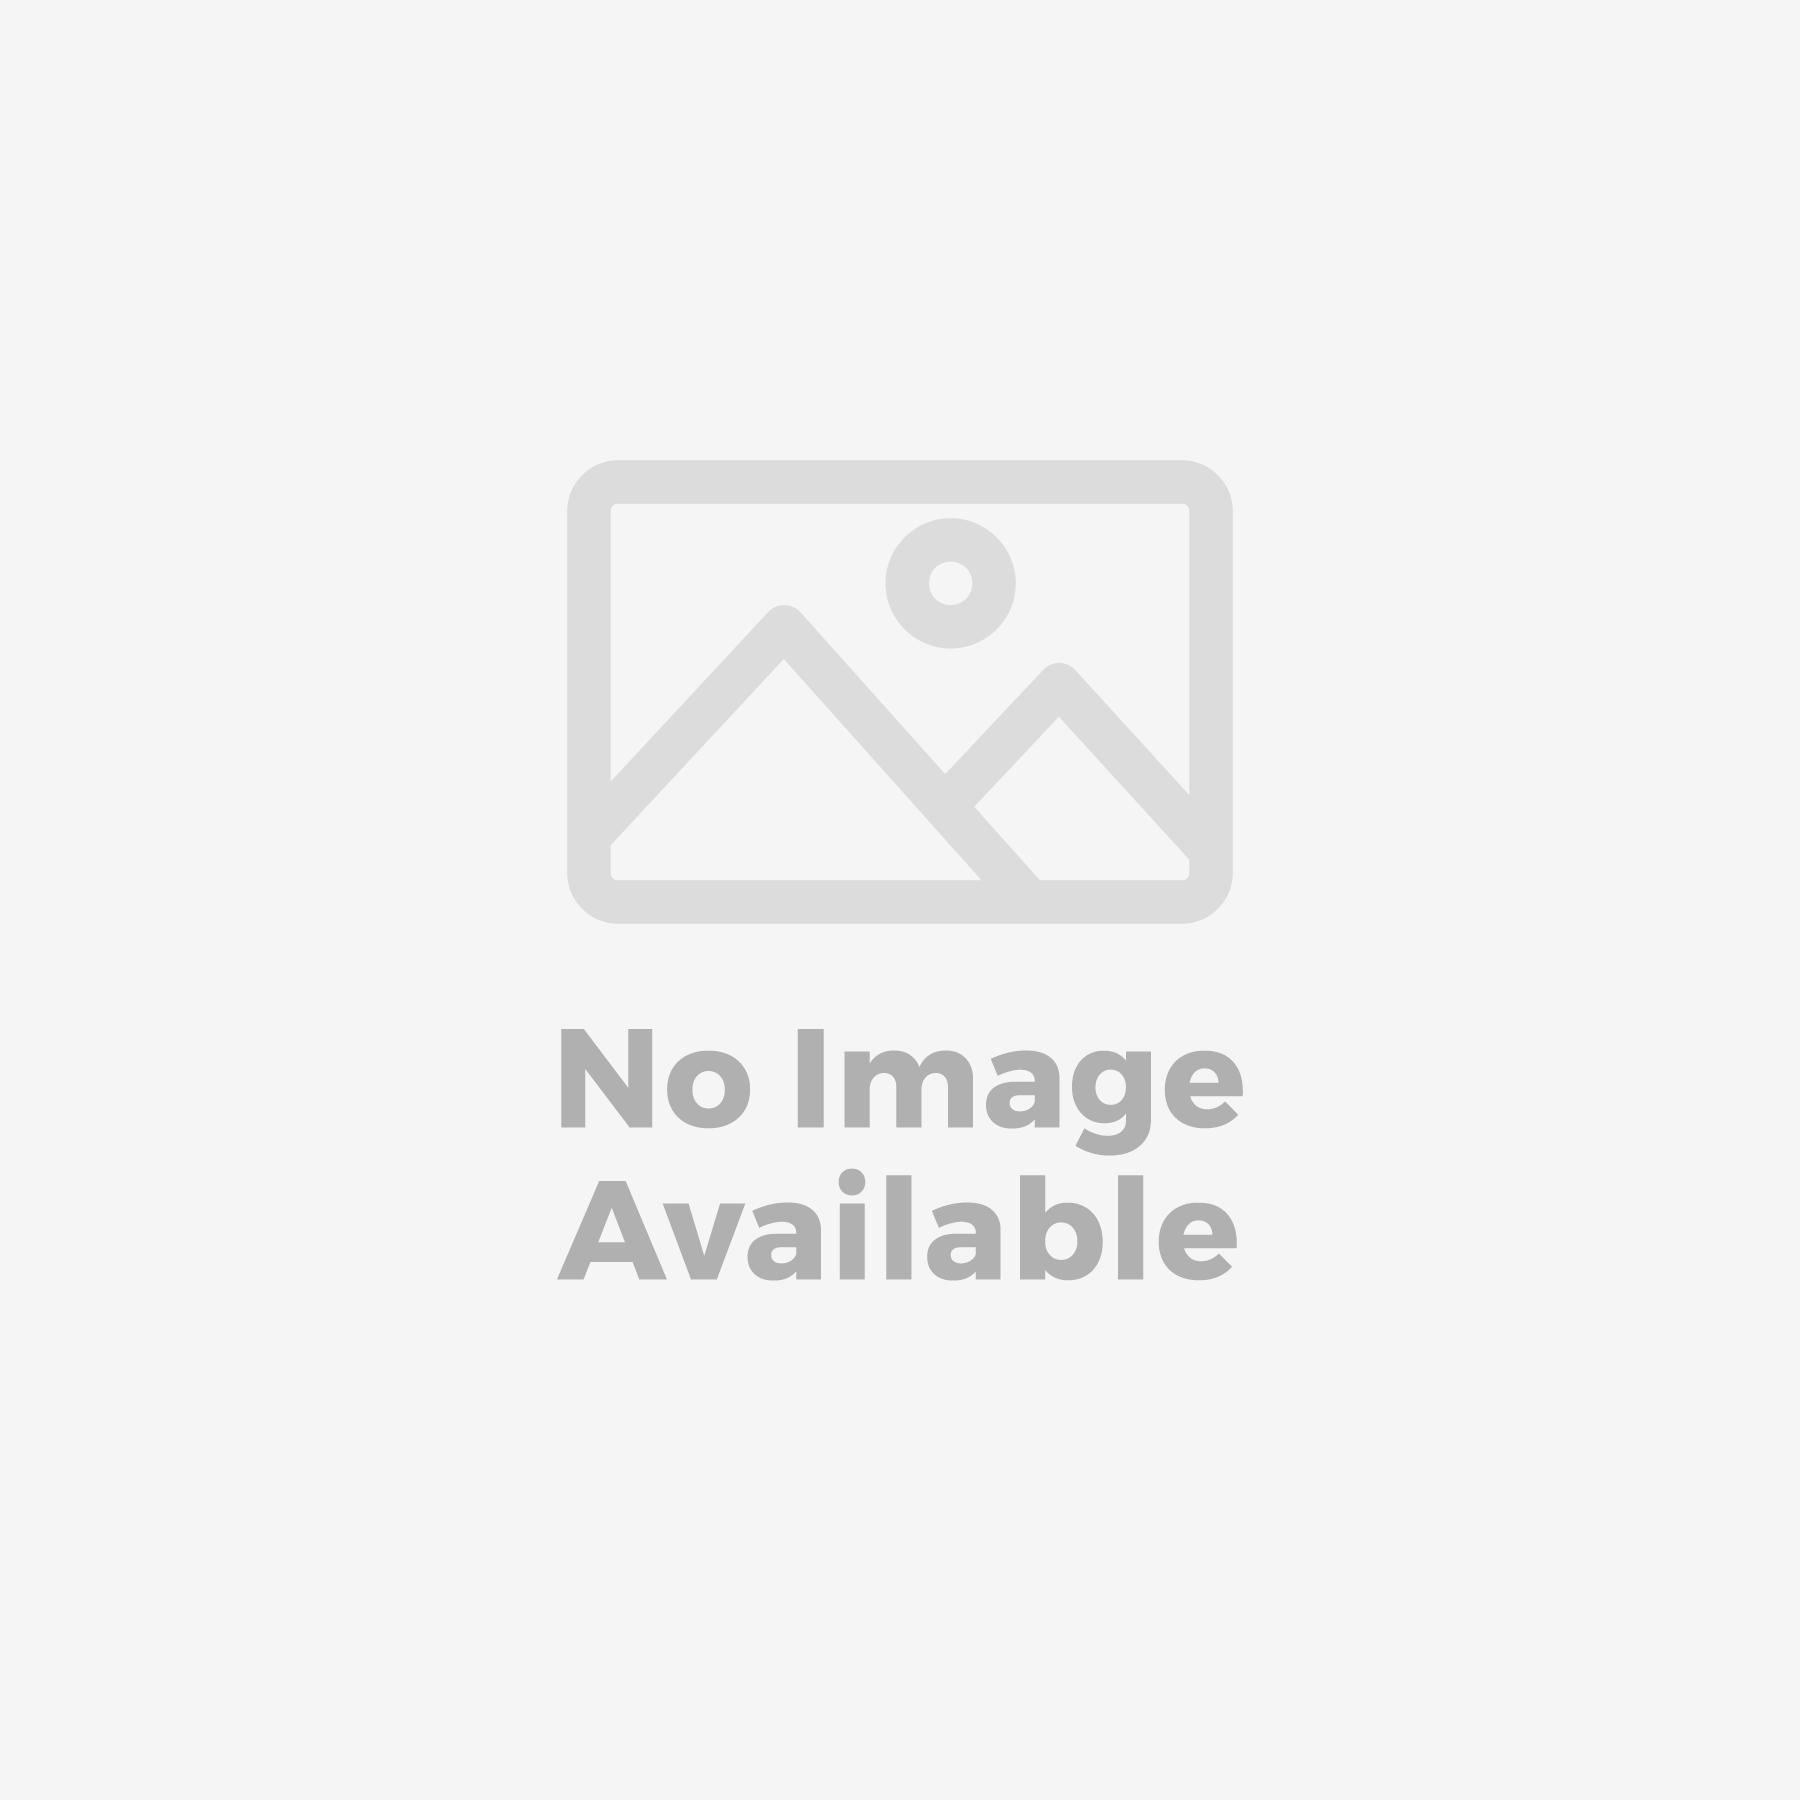 CHAMONIX BOXES